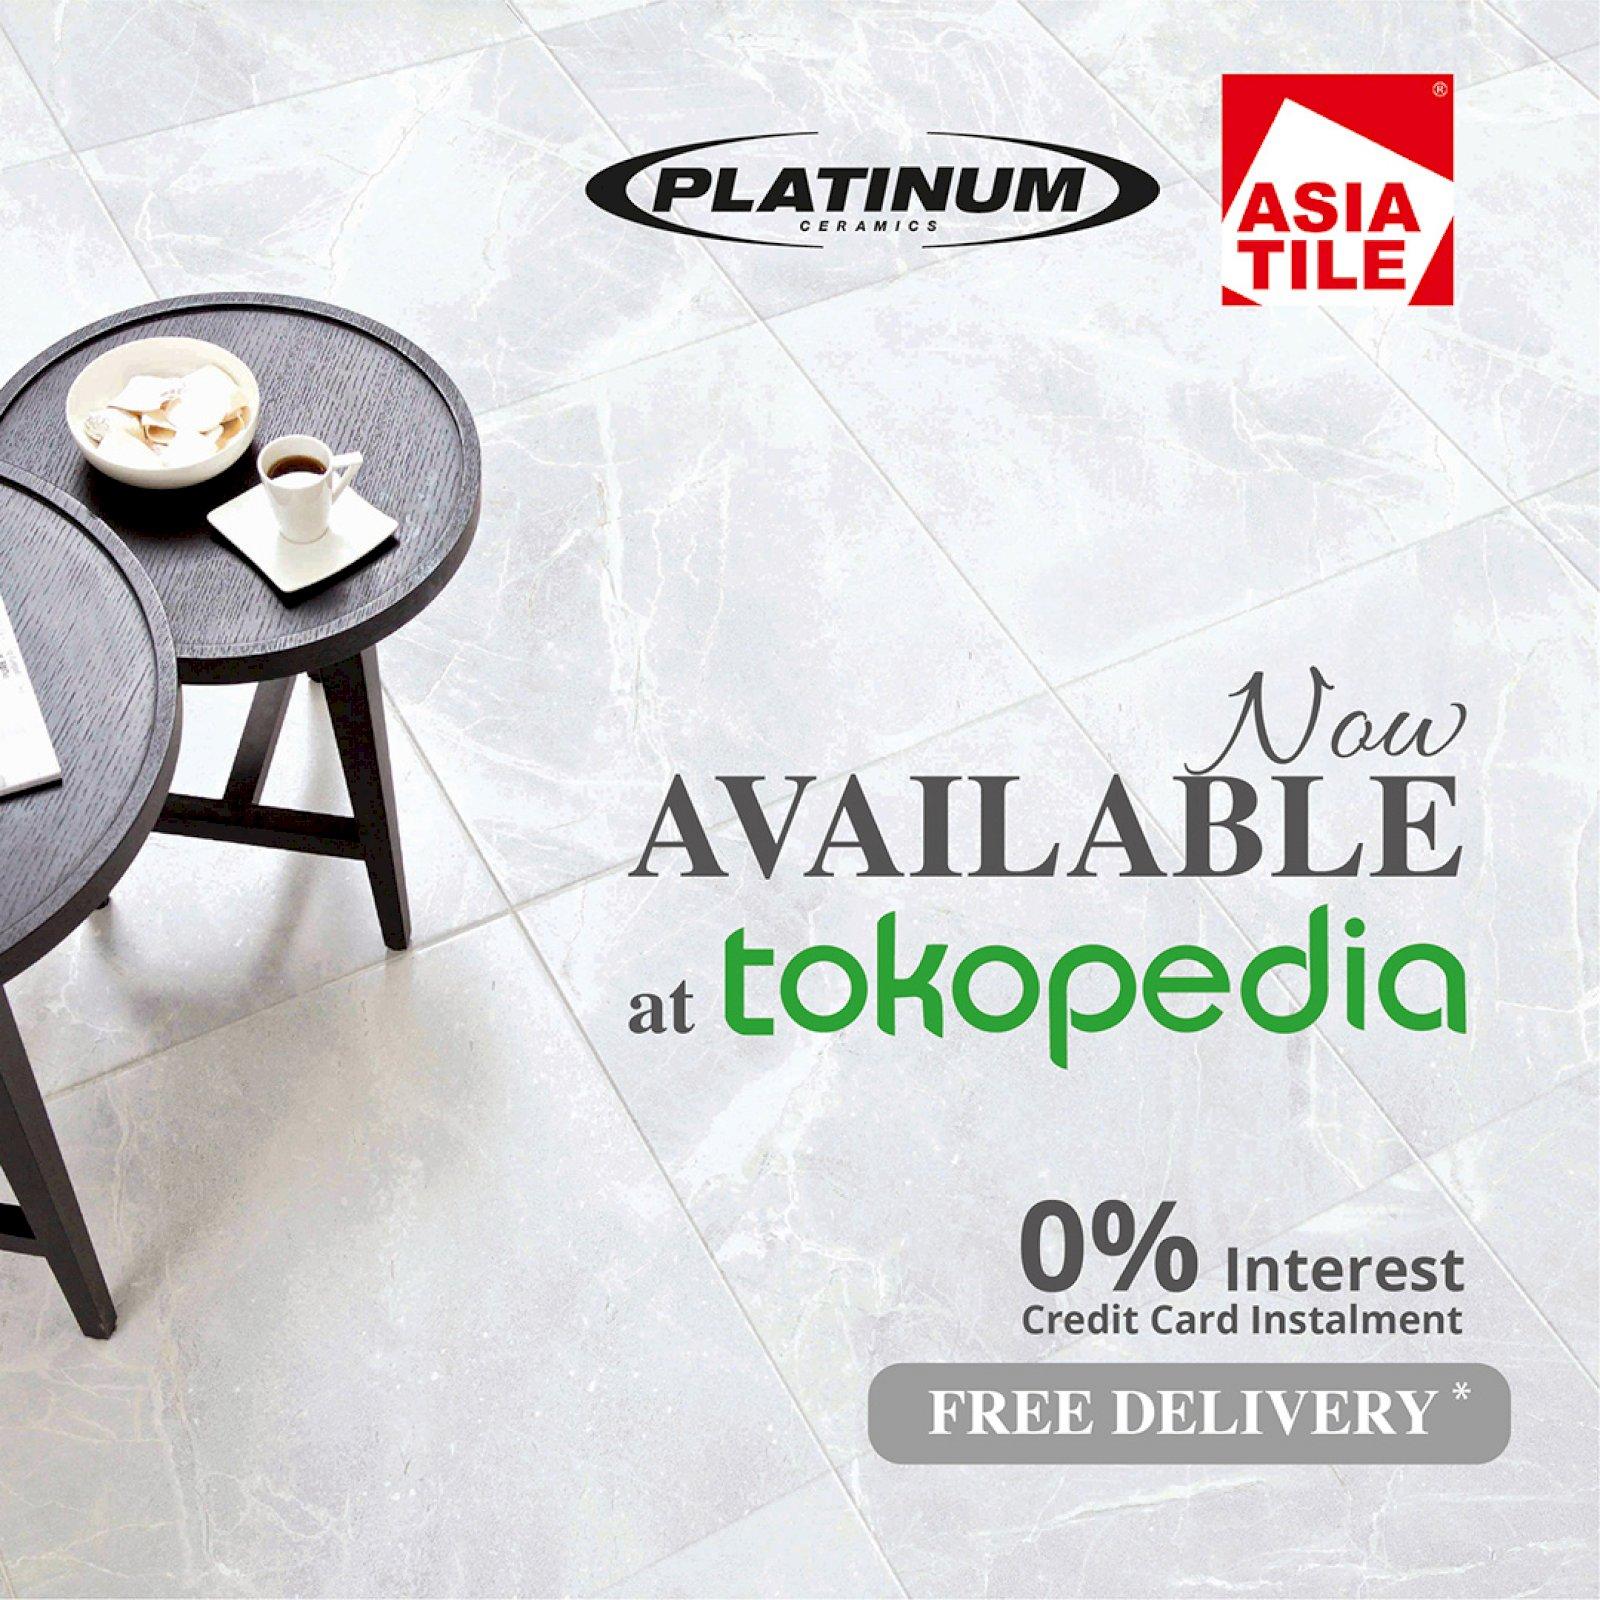 Platinum Ceramics & Asia Tile are now available at Tokopedia